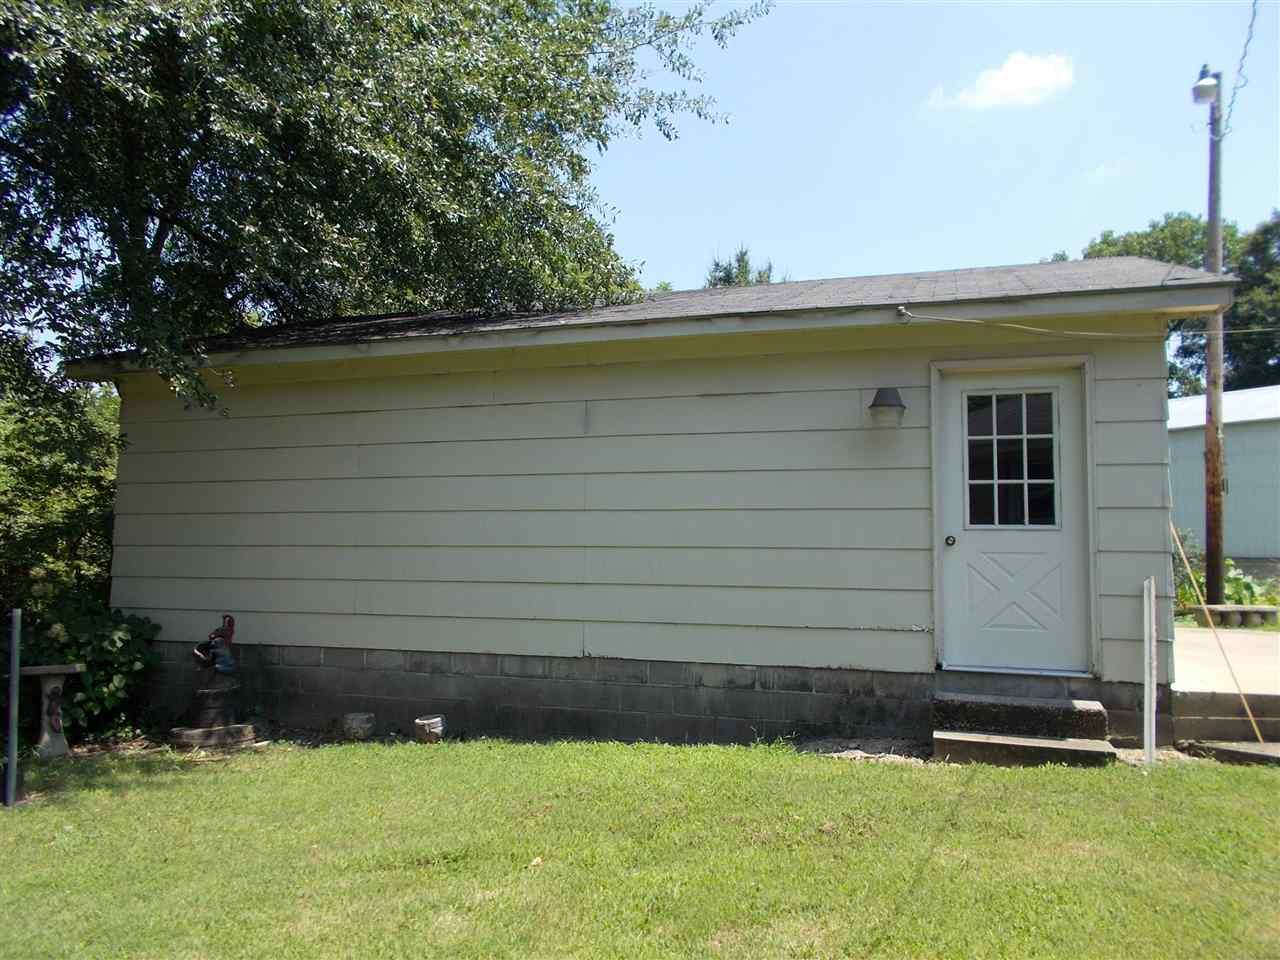 217 Drake Ripley, TN 38063 - MLS #: 10007302